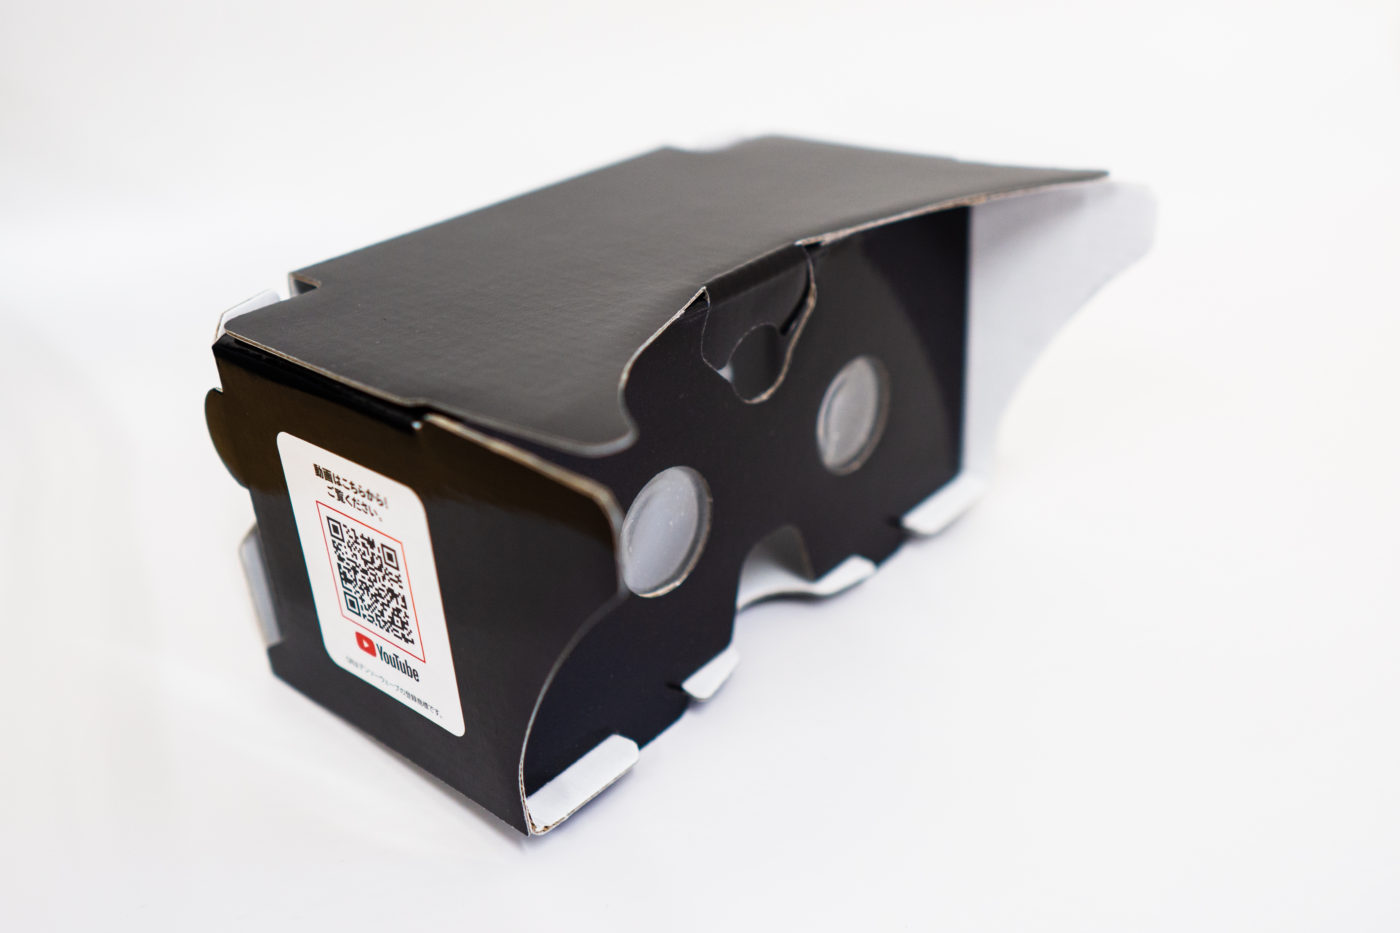 TSP太陽様オリジナルVRゴーグル 二次元バーコード